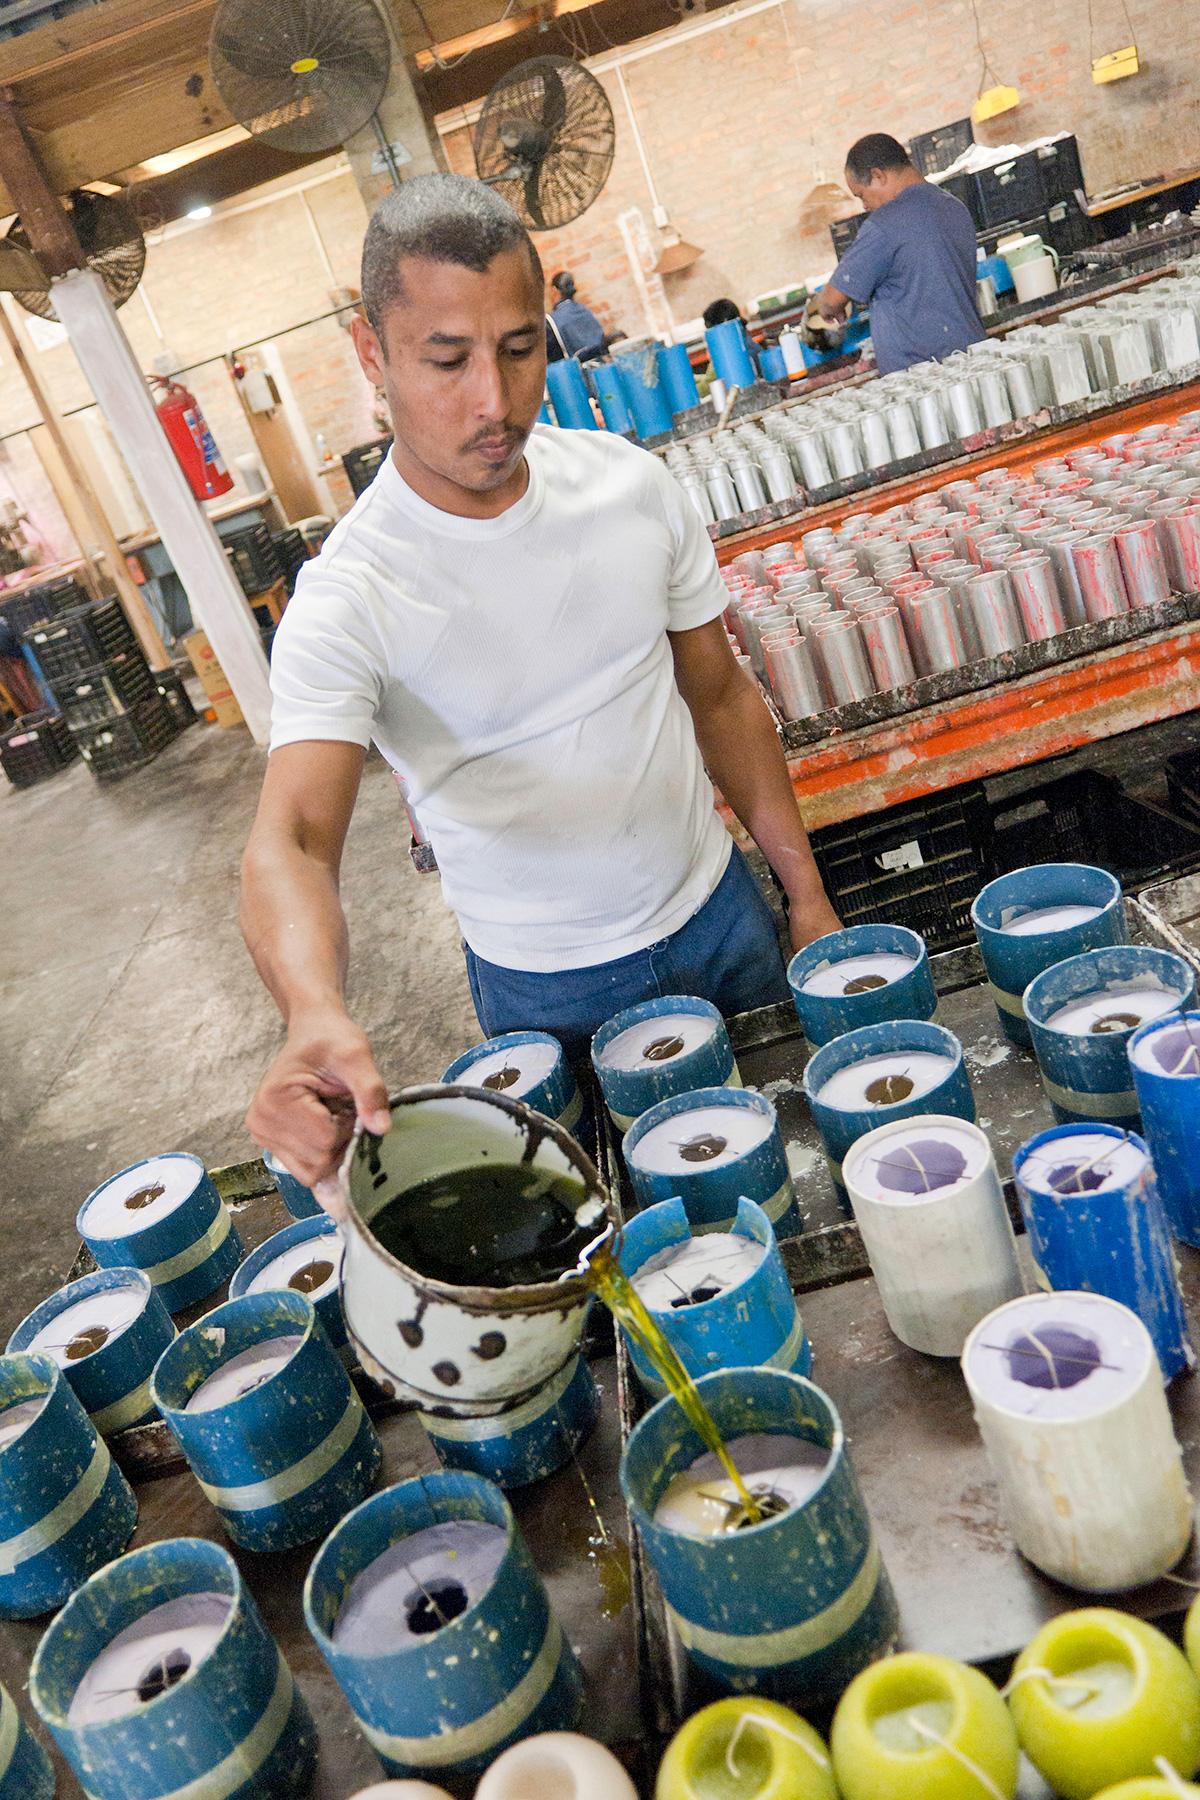 kapula-hand-poured-candles-process-manufacturer.jpg